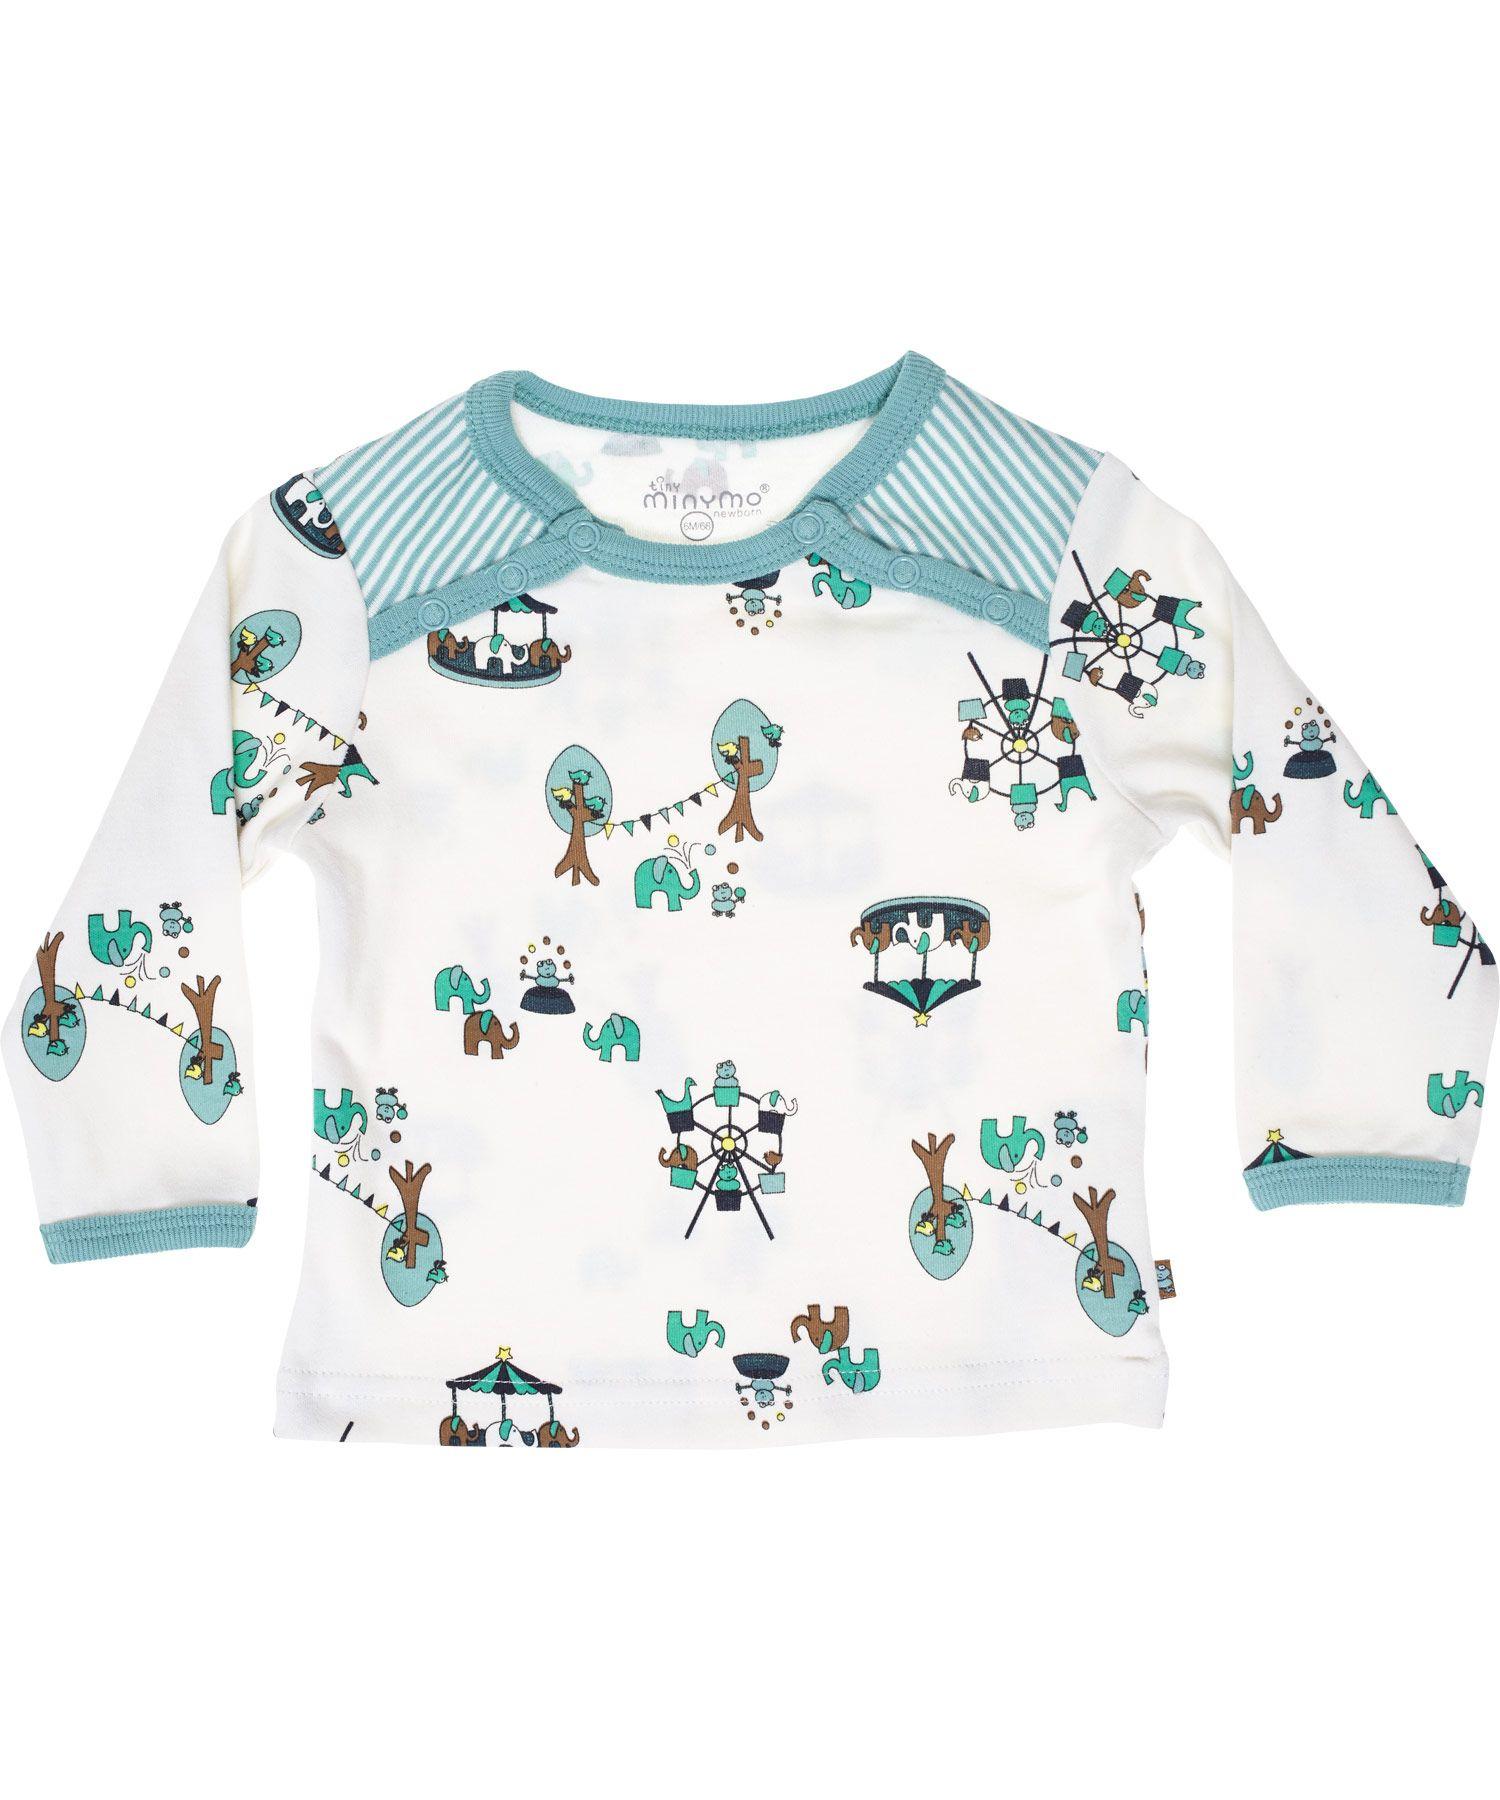 35673e352 Minymo cute circus theme baby t-shirt | Kids Clothing | Kids outfits ...